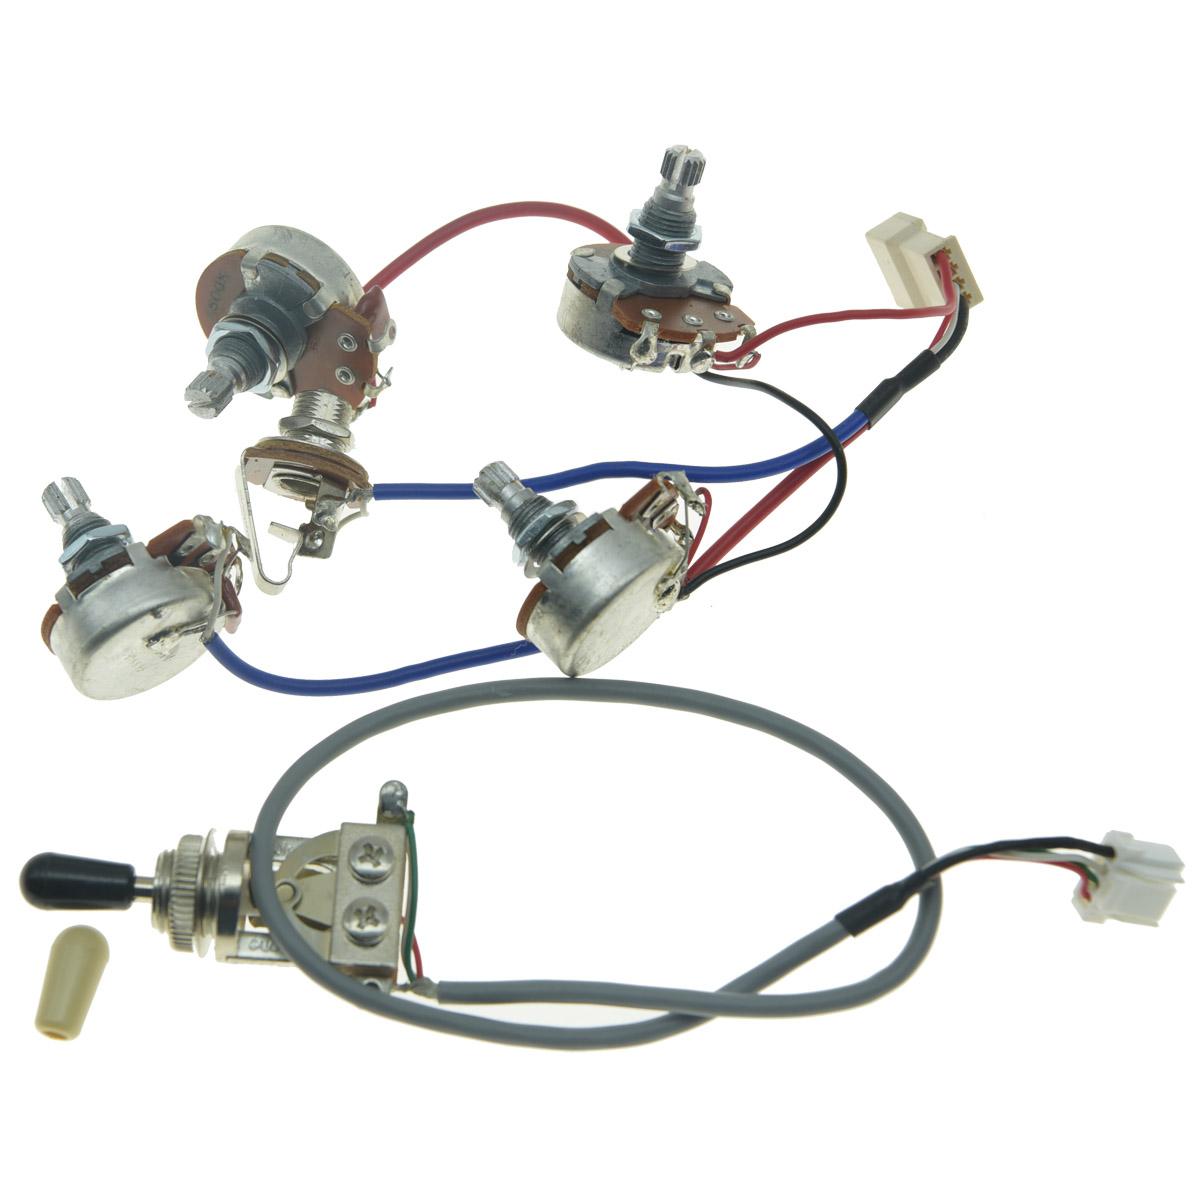 Original Lp Guitar Pickup Wiring Harness W Alpha Js Pots For Epiphone Les Paul Ebay